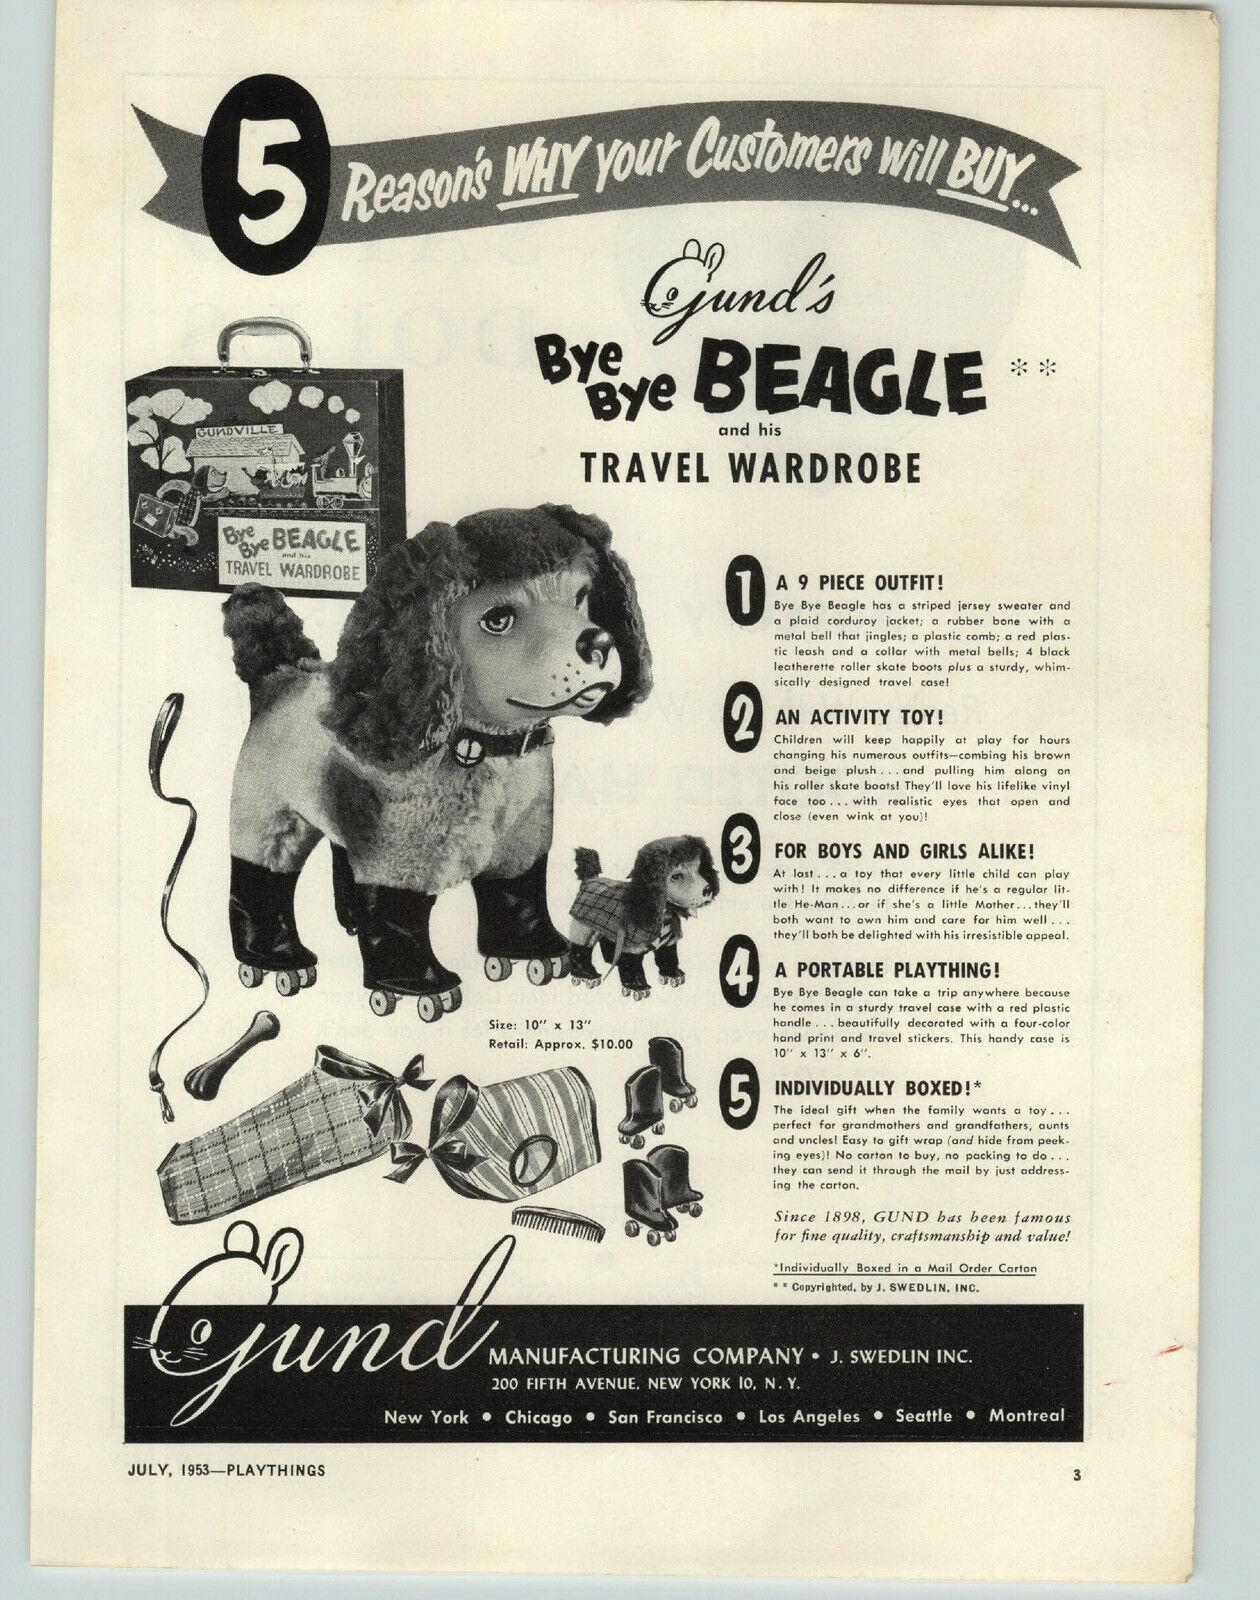 Bye bye beagle ad